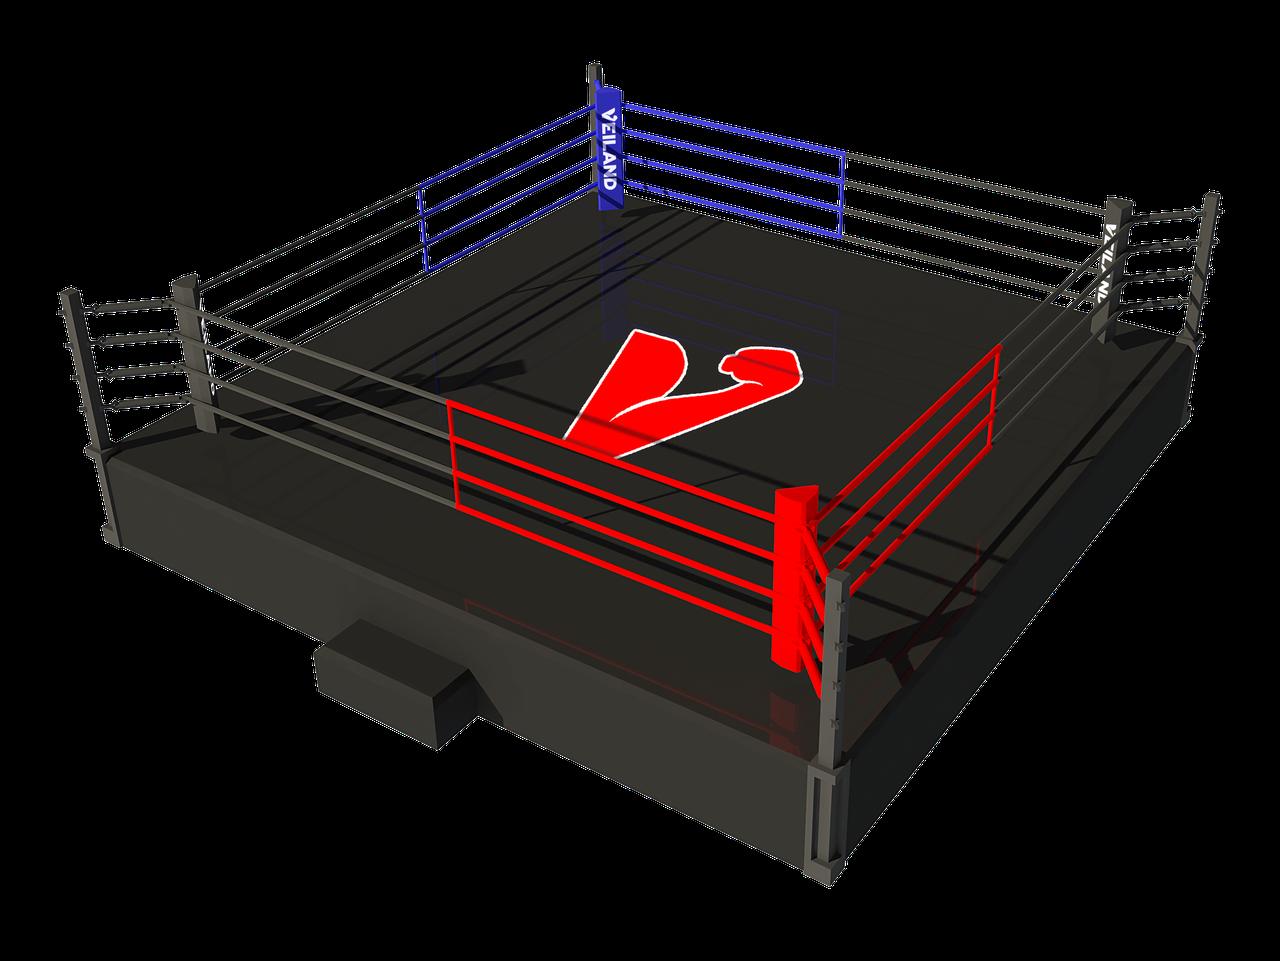 Боксерский ринг на помосте 7,5х7,5 м (боевая зона 6х6 м), помост 1 м